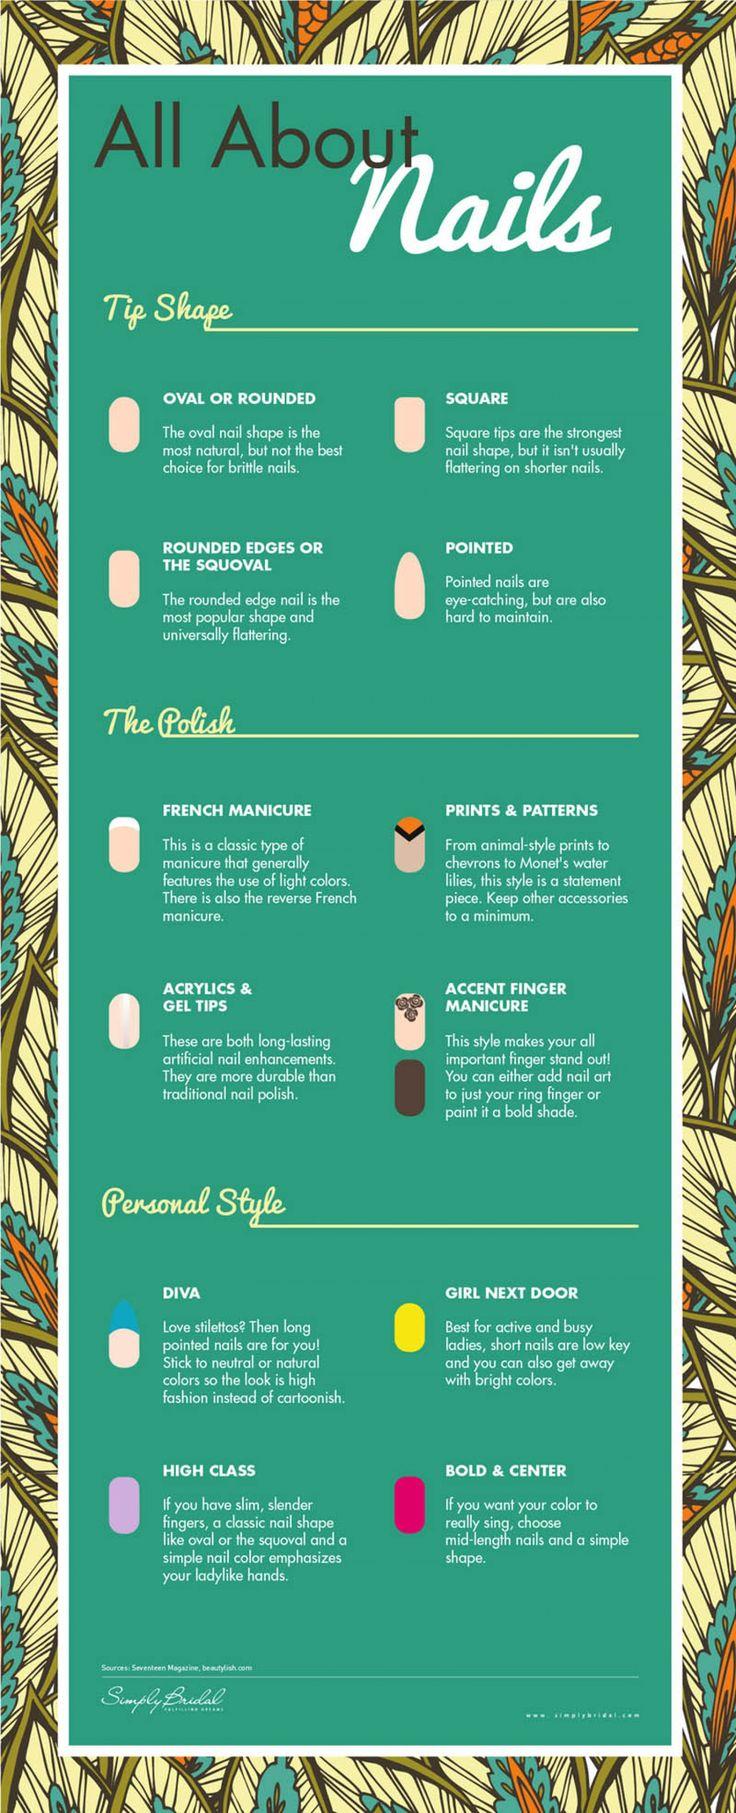 All About Nails [by Simply Bridal via Tipsographic] #nails #nailart #nailartdesign #nailcare #manicure #tipsographic